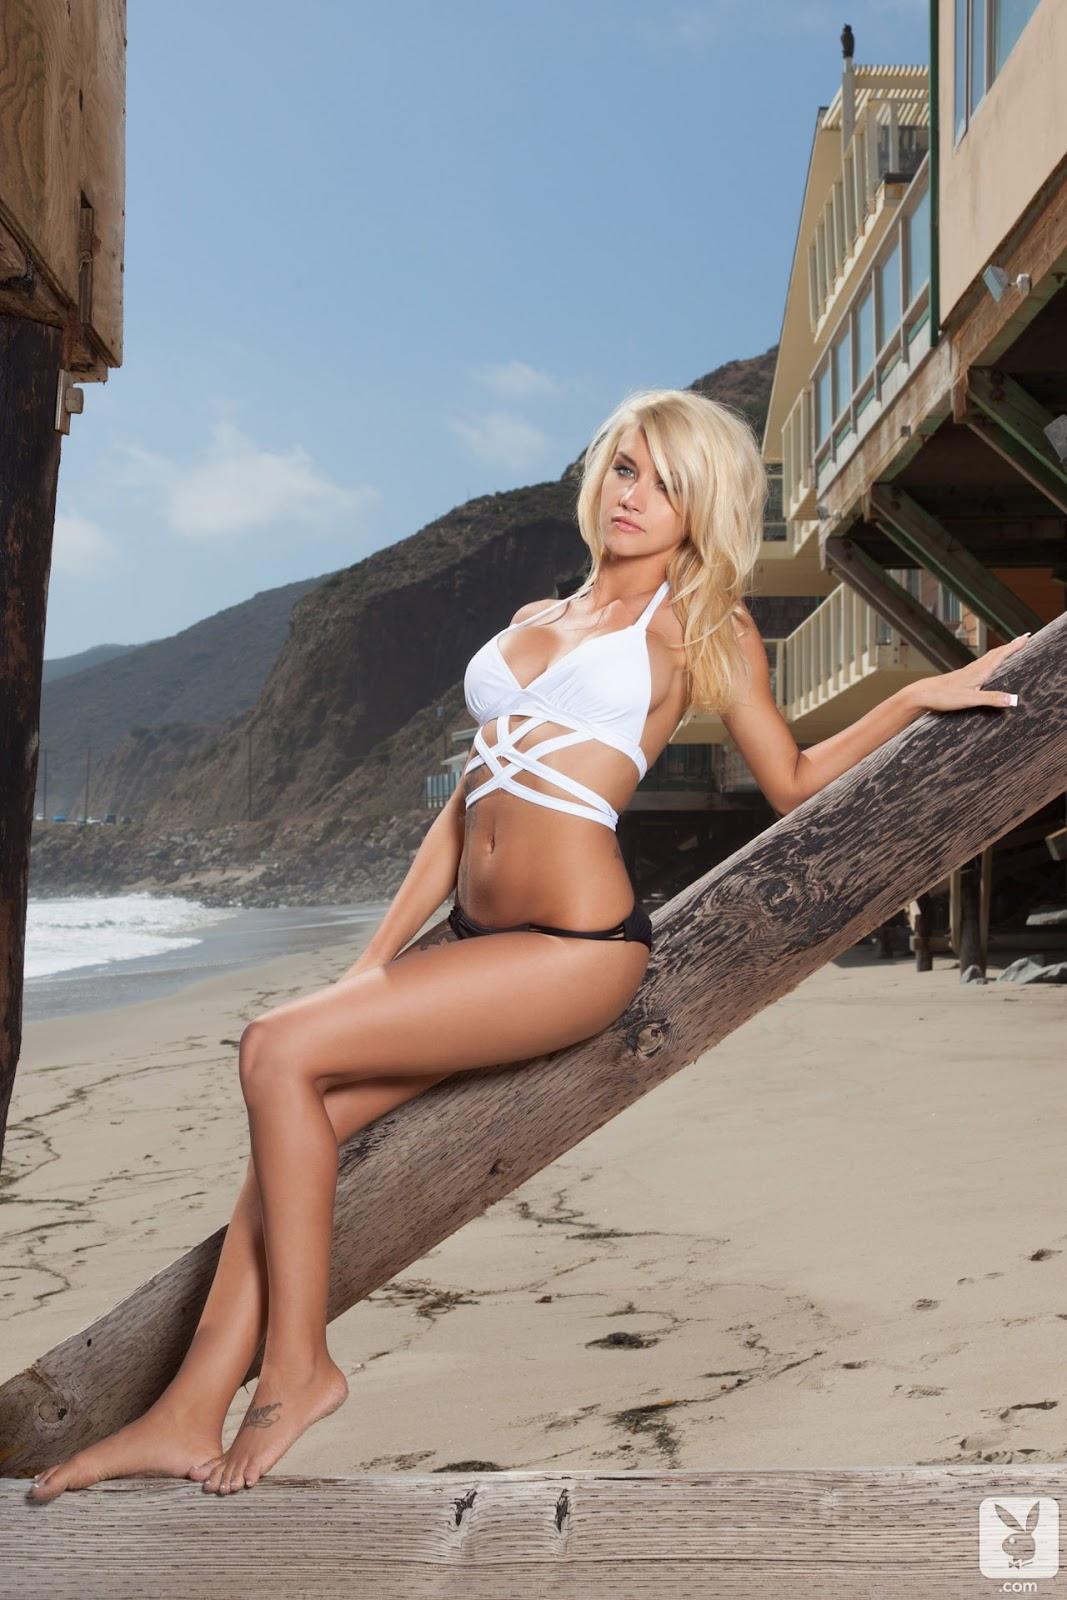 WHot Naked Girls: Taylor Seinturier Bikini